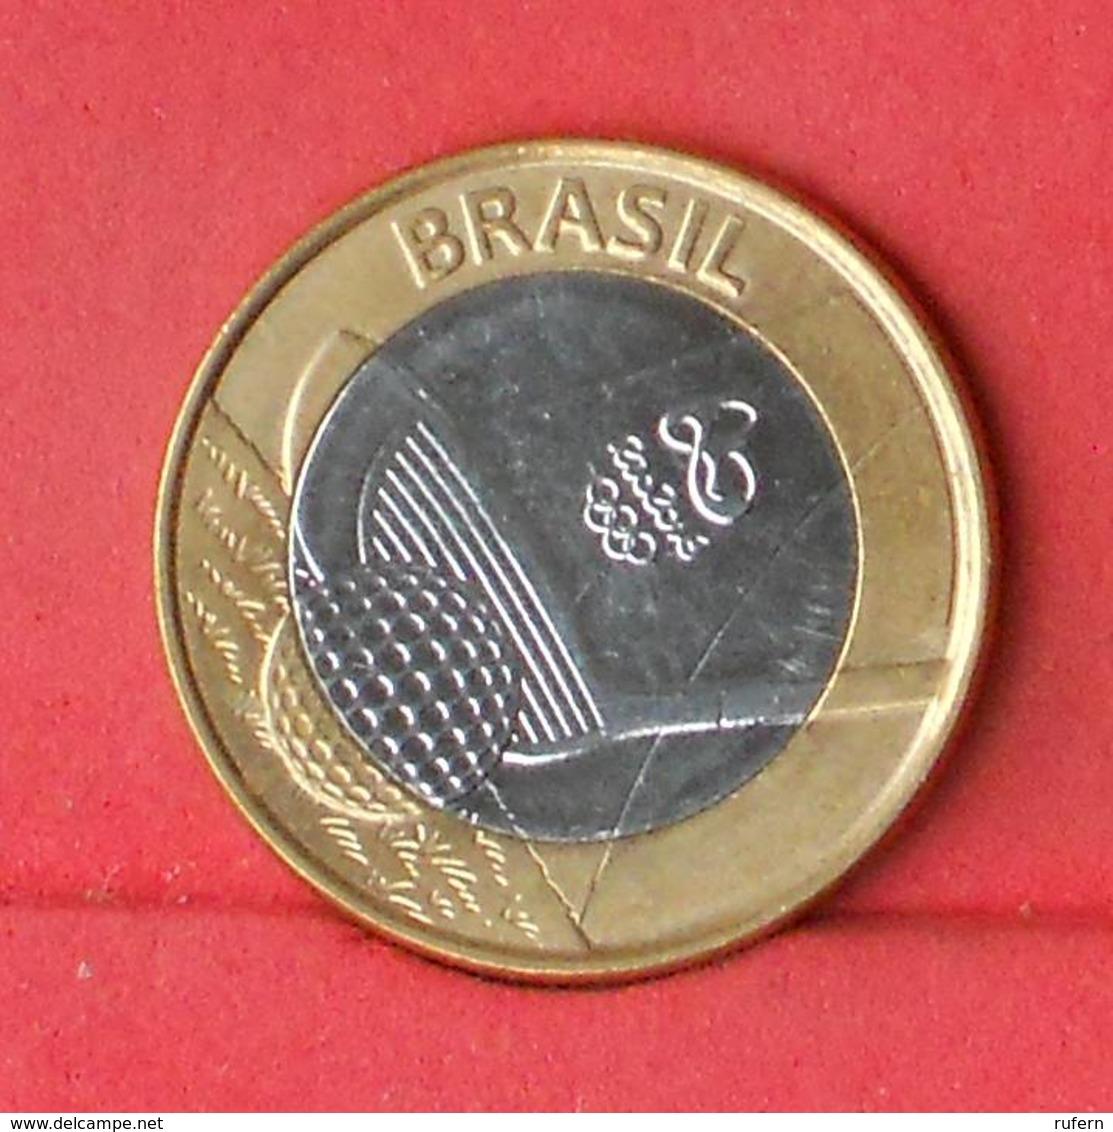 BRAZIL 1 REAL 2014 - RIO 2016     - (Nº26902) - Brésil